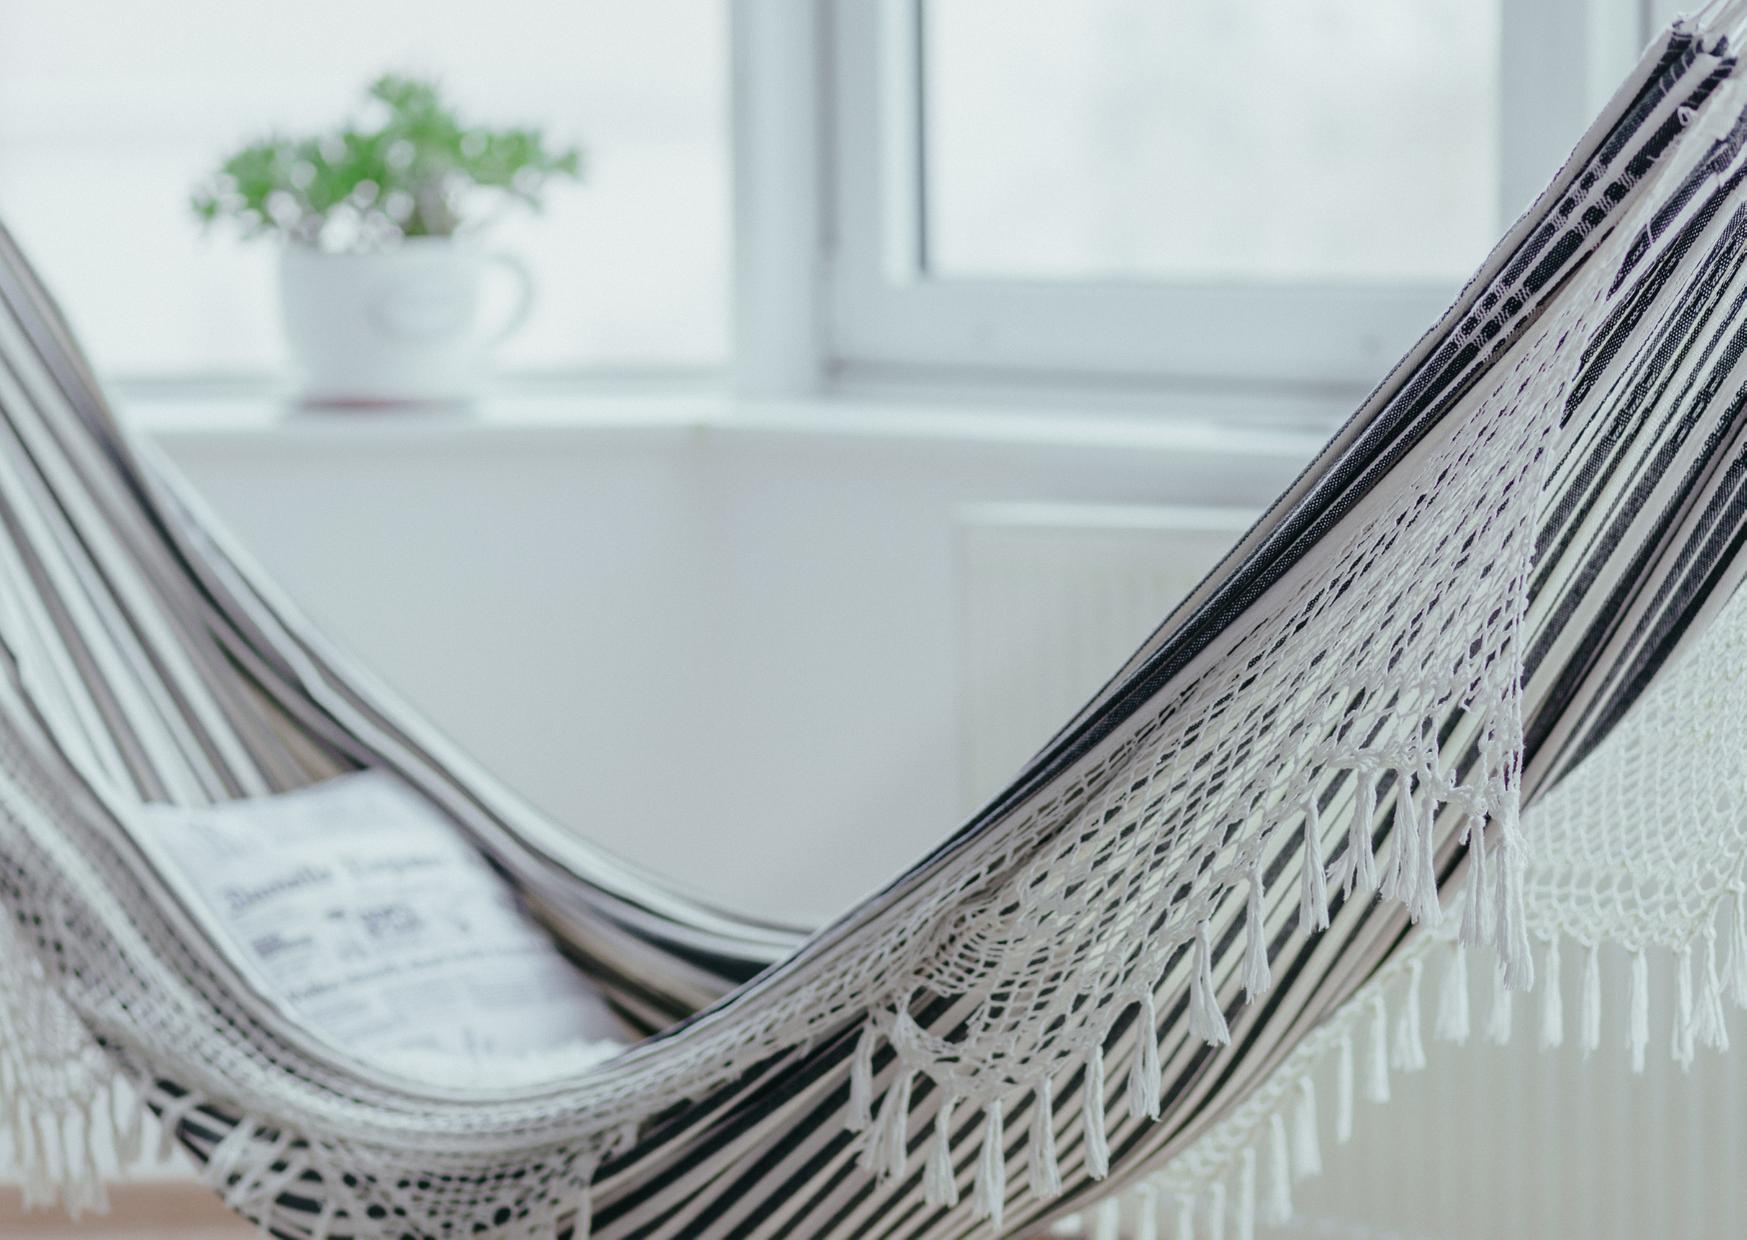 a gray hammock inside the house